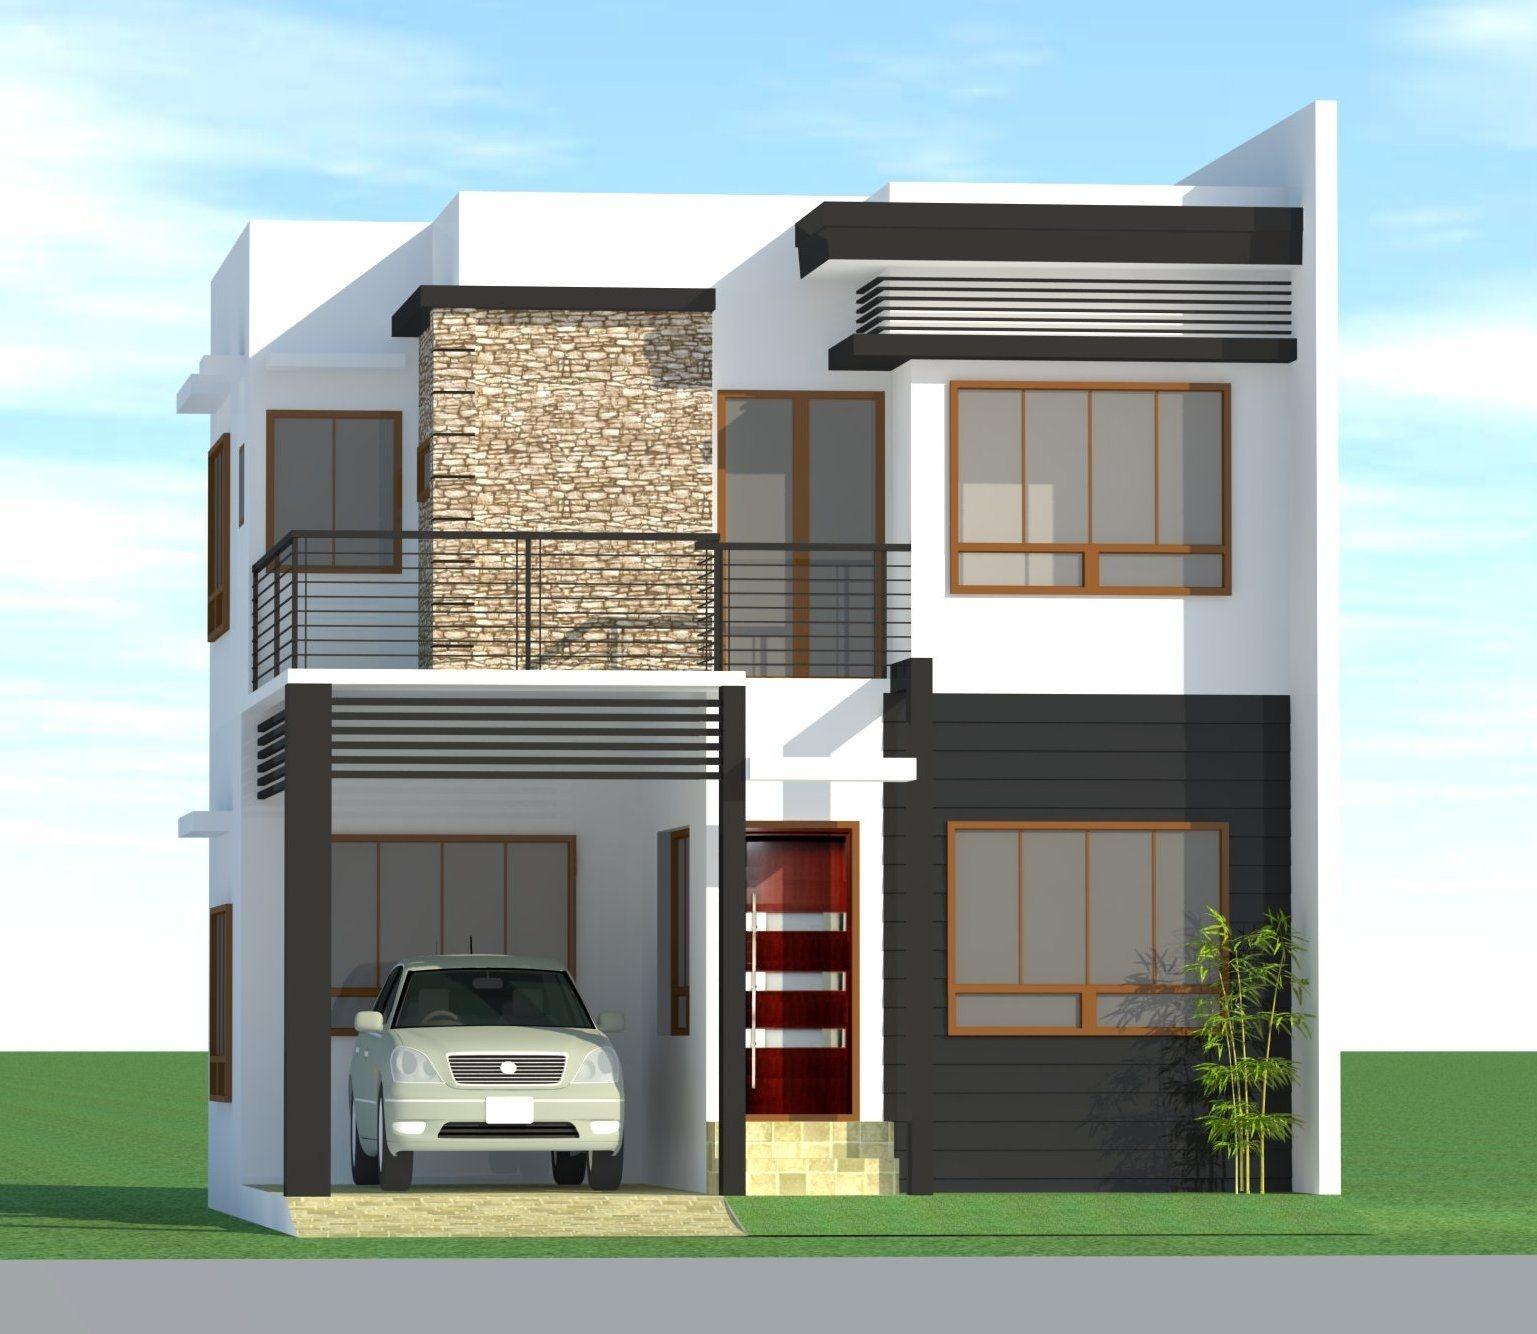 Fyi house design photo philippines